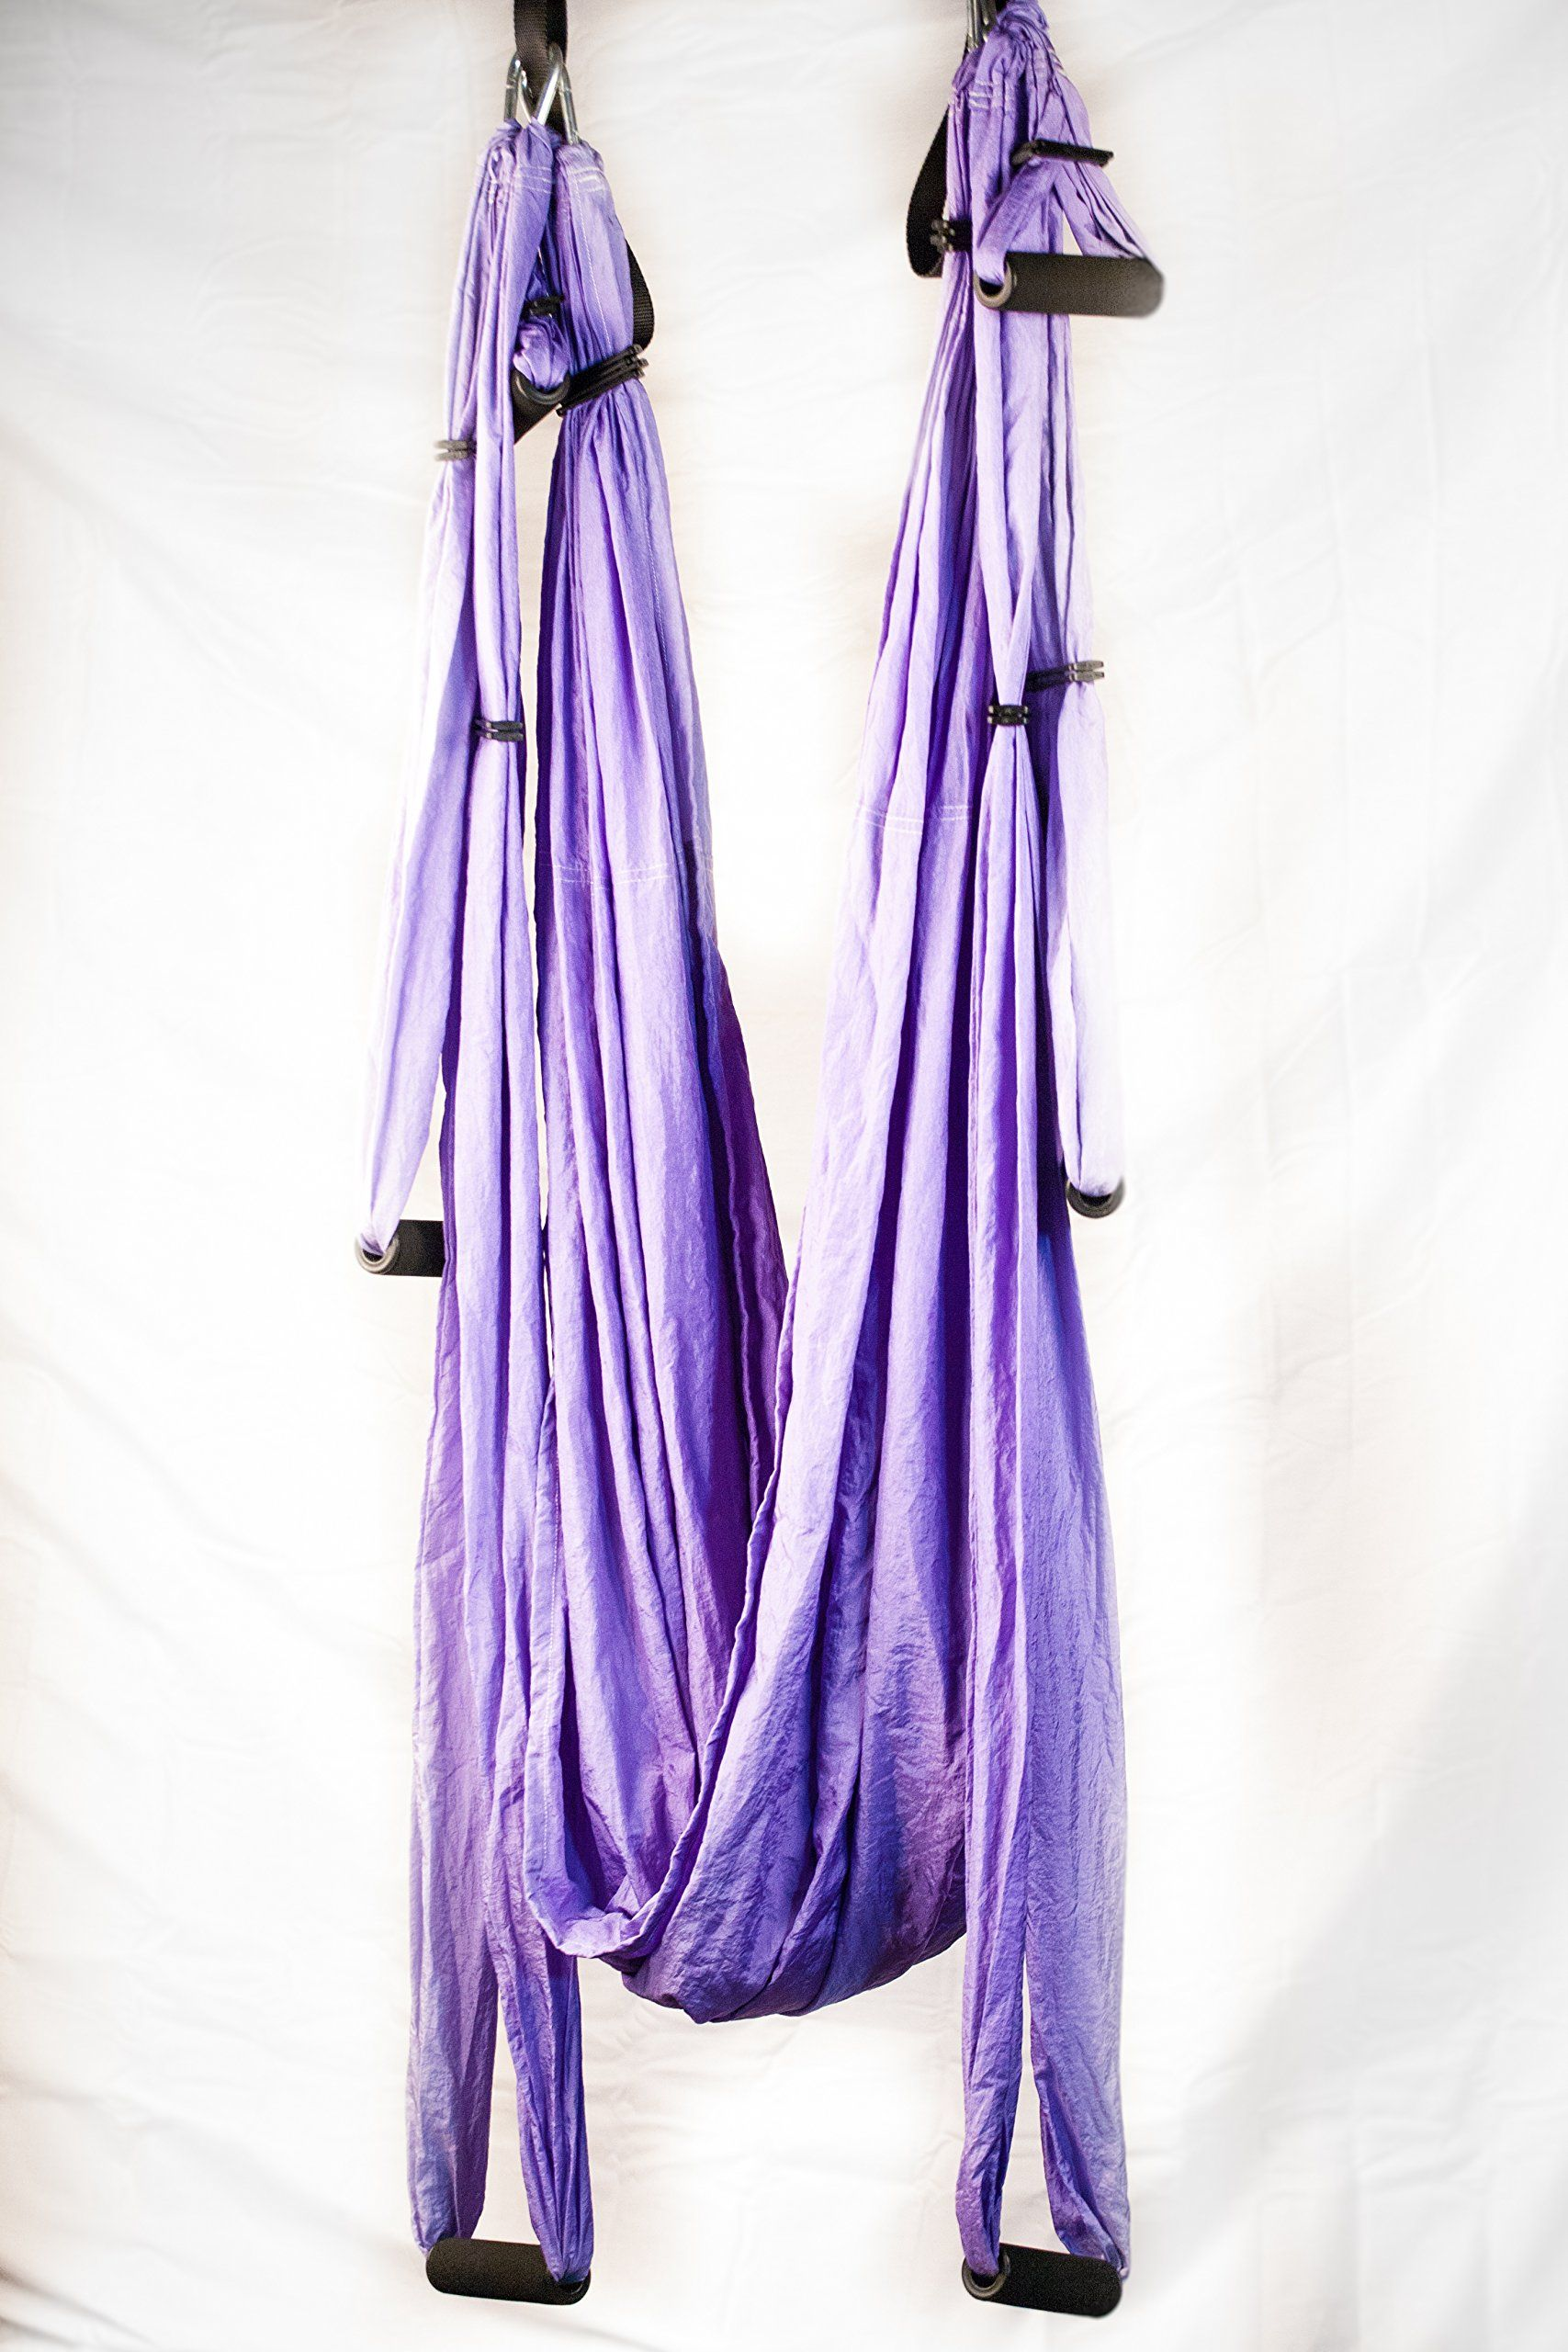 Yoga swing antigravity meditation hammock inversion sling aerial